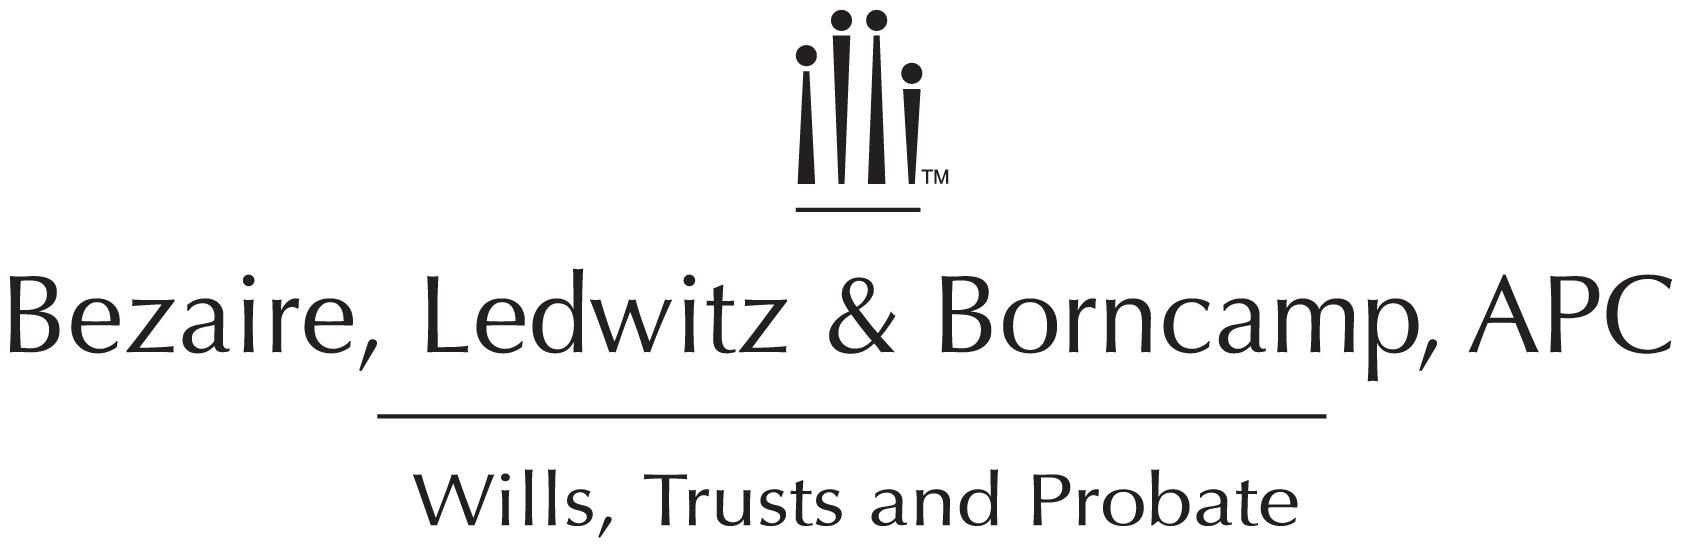 The Law Firm of Bezaire Ledwitz & Borncamp APC - Torrance, CA